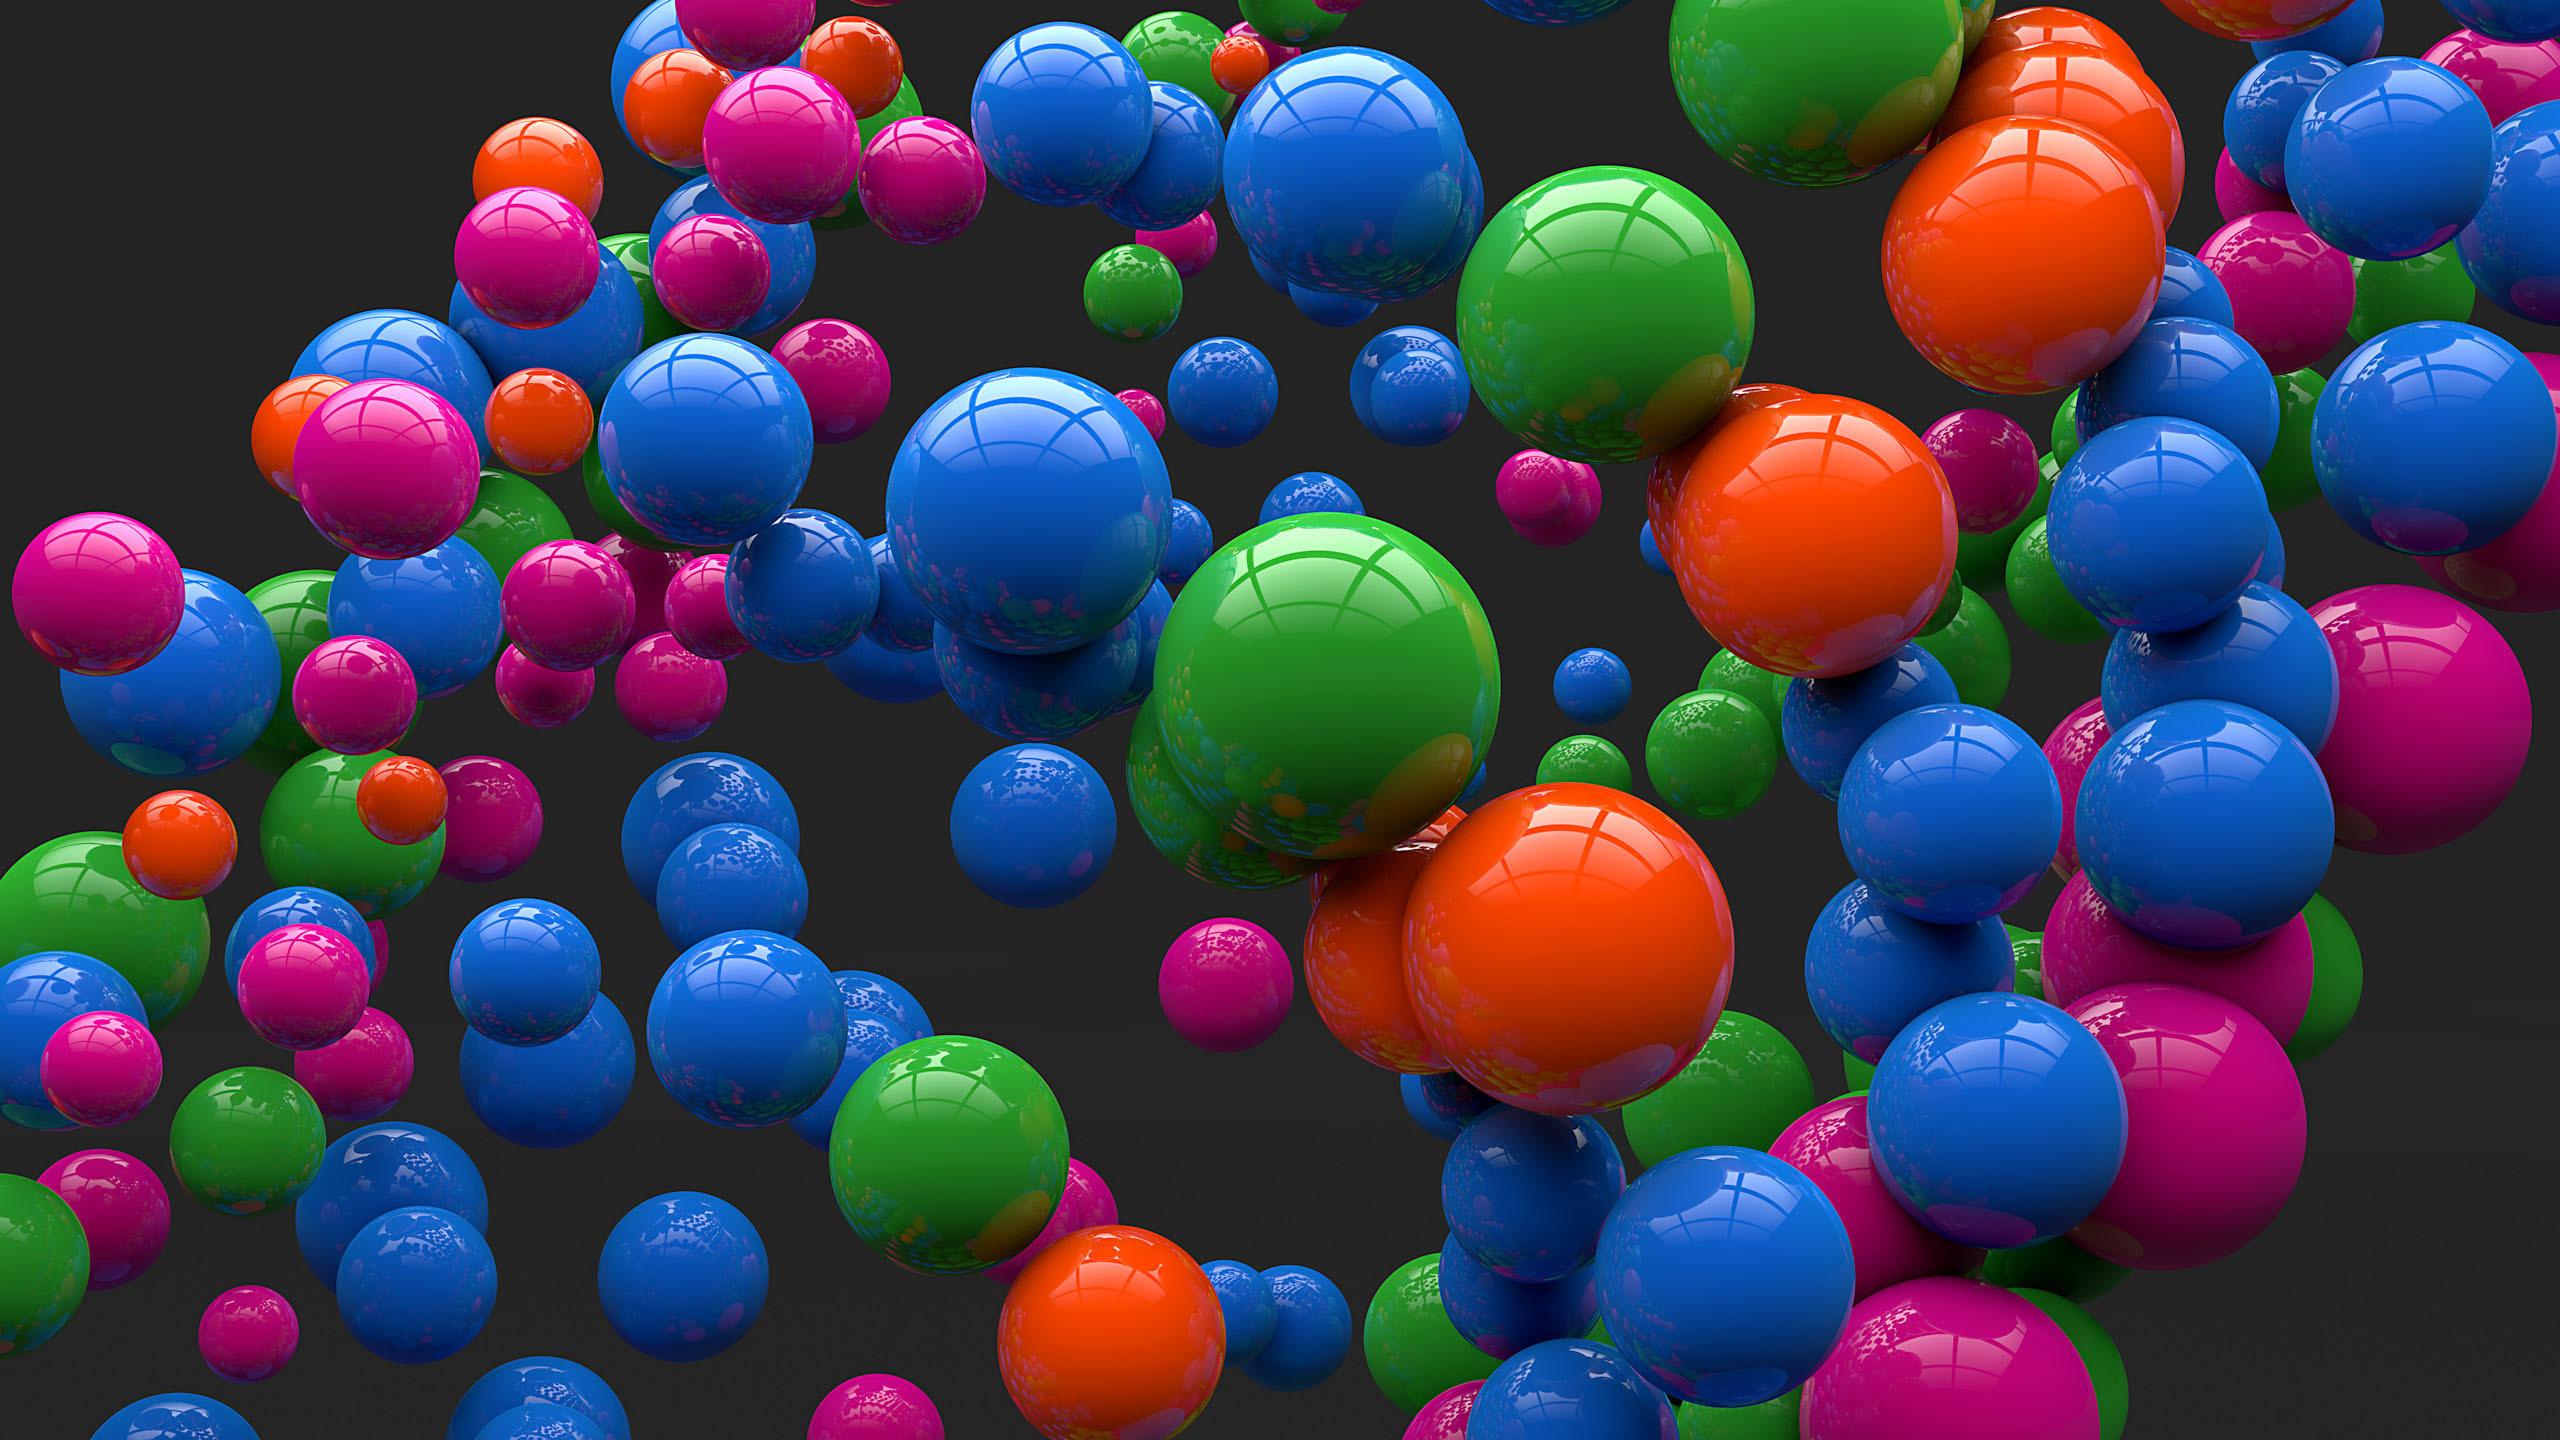 Cool Orange Bubbles wallpaper x